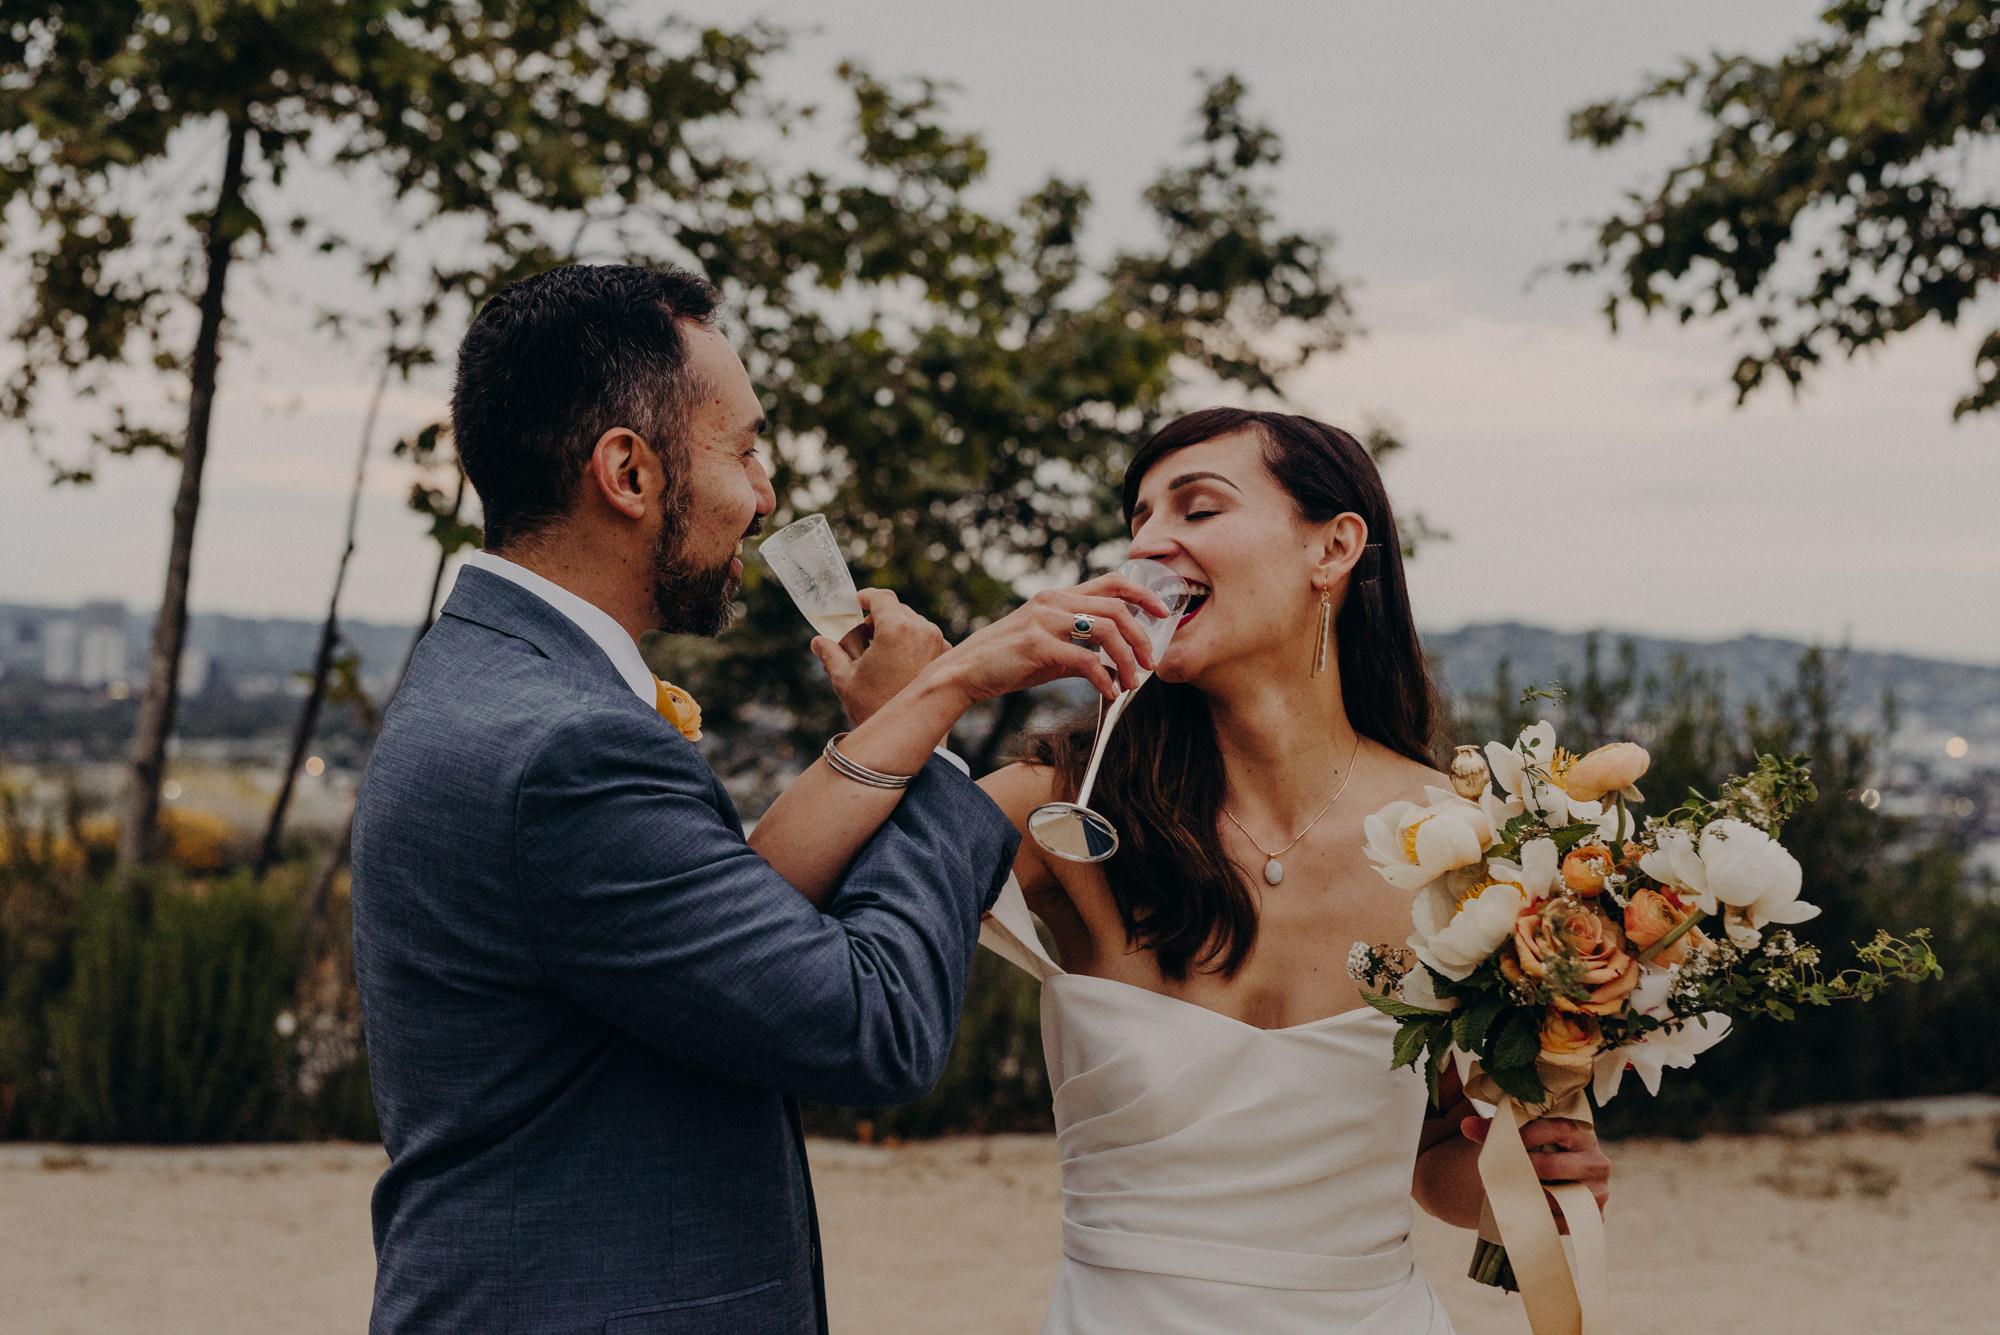 elopement photographer in los angeles - la wedding photographer - isaiahandtaylor.com-074.jpg